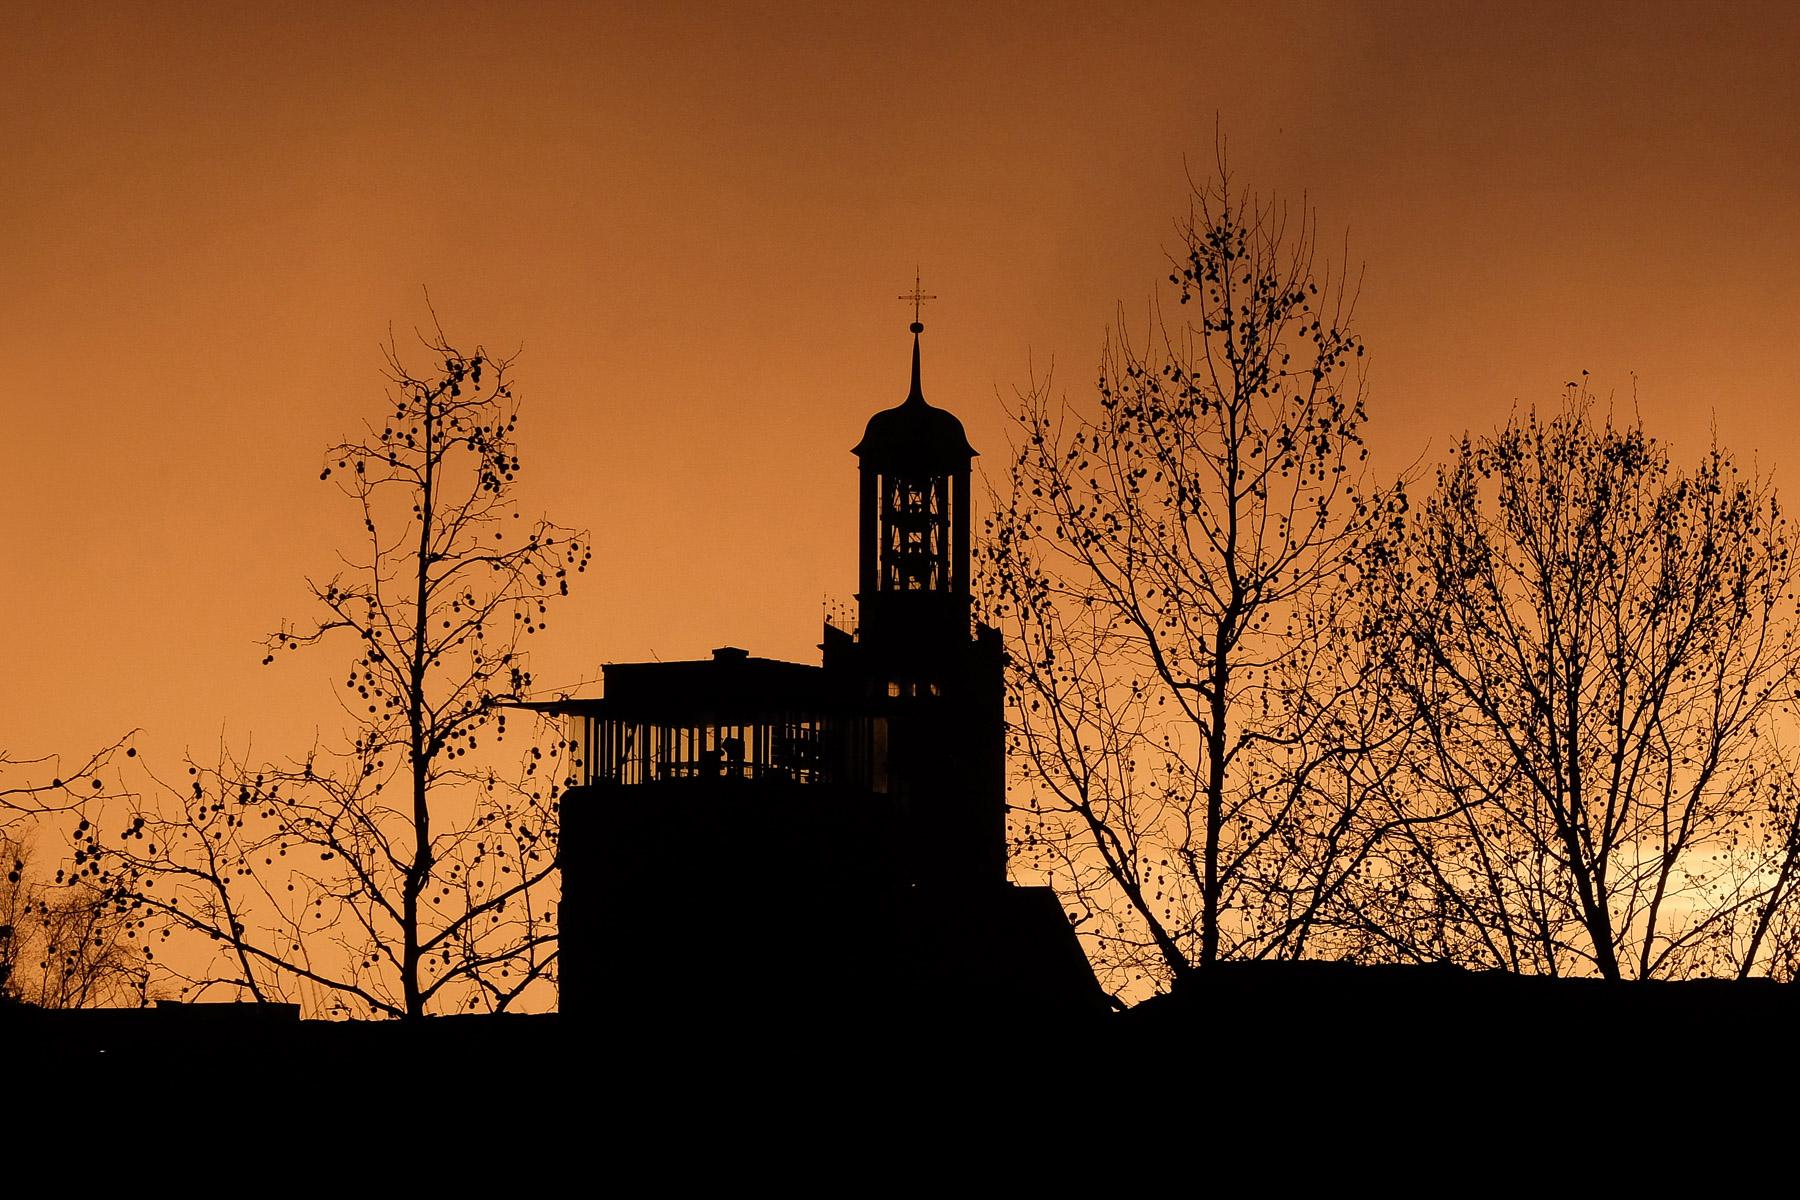 Abendhimmel in Darmstadt (Foto: Olaf Nagel)